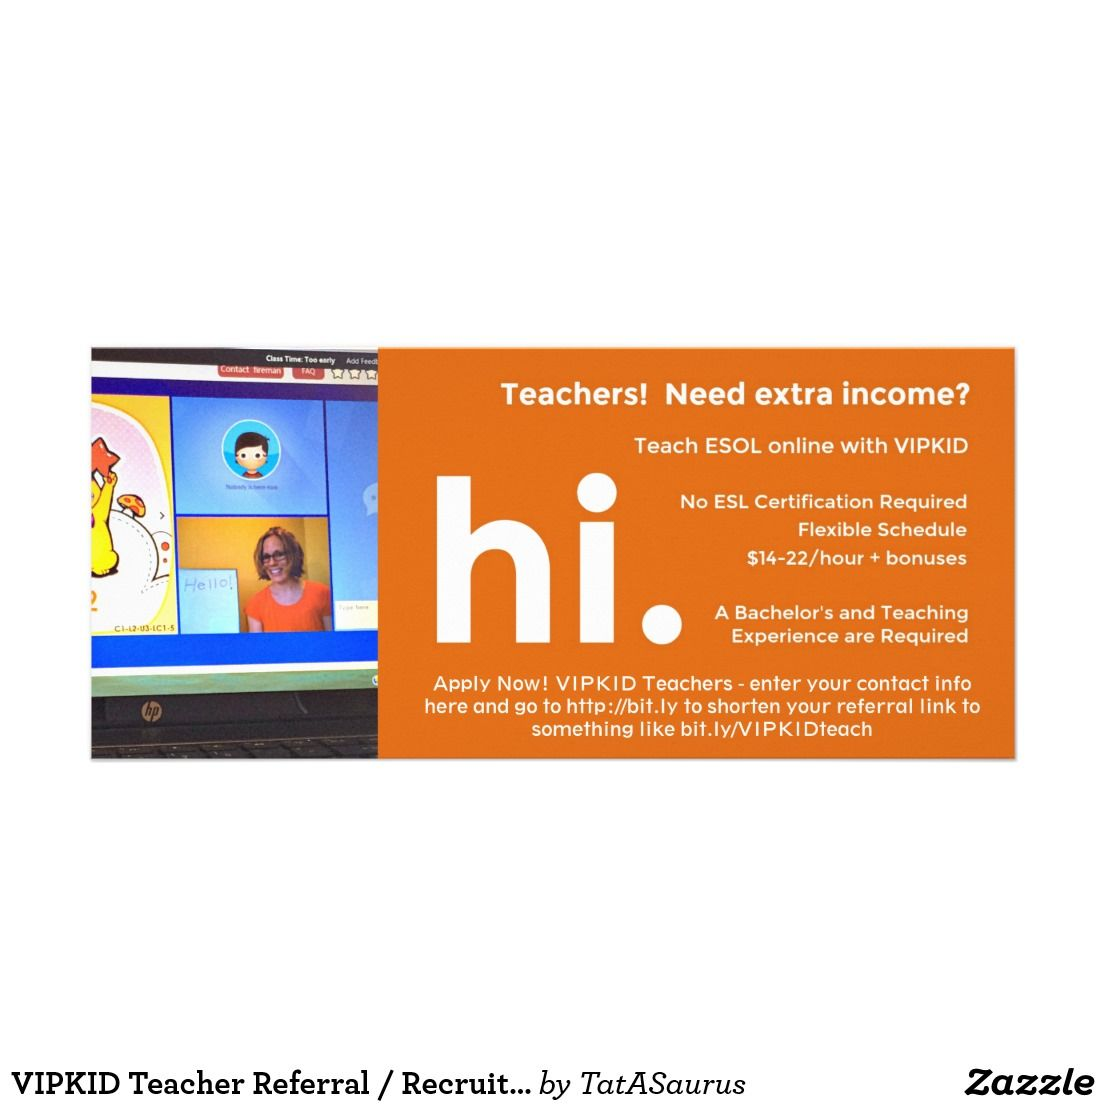 Vipkid teachers recruitment cards they are 4x8 glossy and thick vipkid teachers recruitment cards they are 4x8 glossy and thick cardstock they look xflitez Images